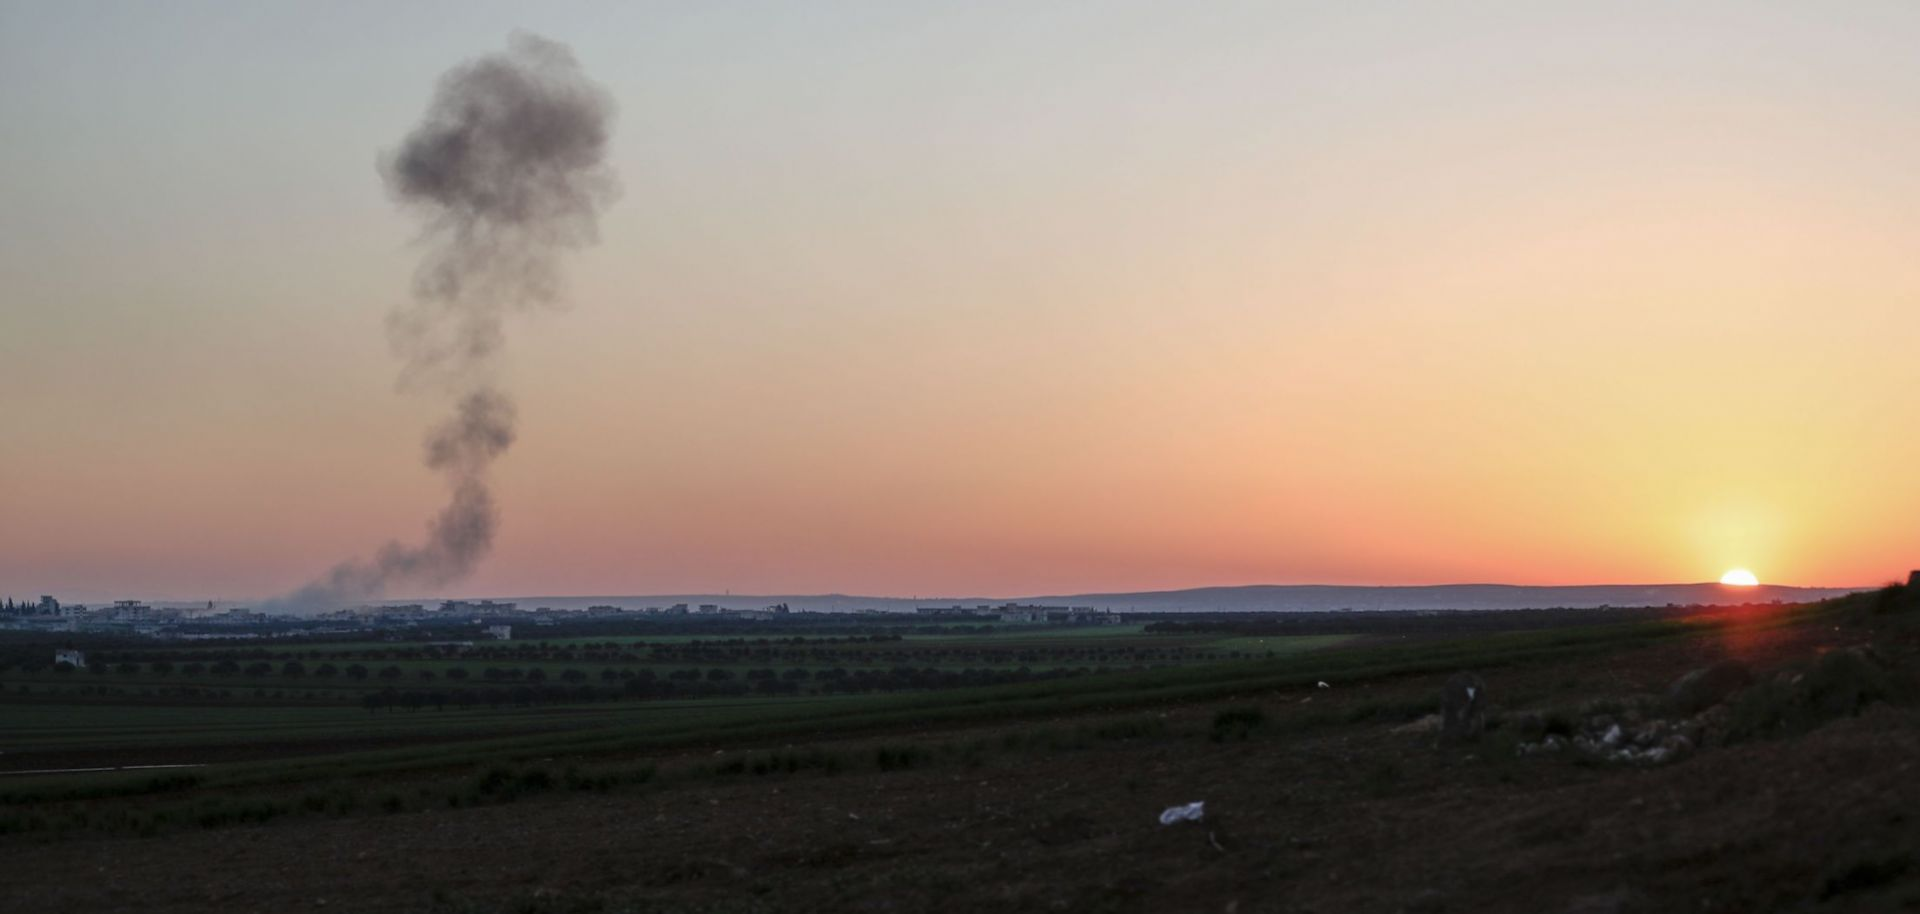 Smoke billows above a Syrian village following an airstrike raid on March 3, 2020.